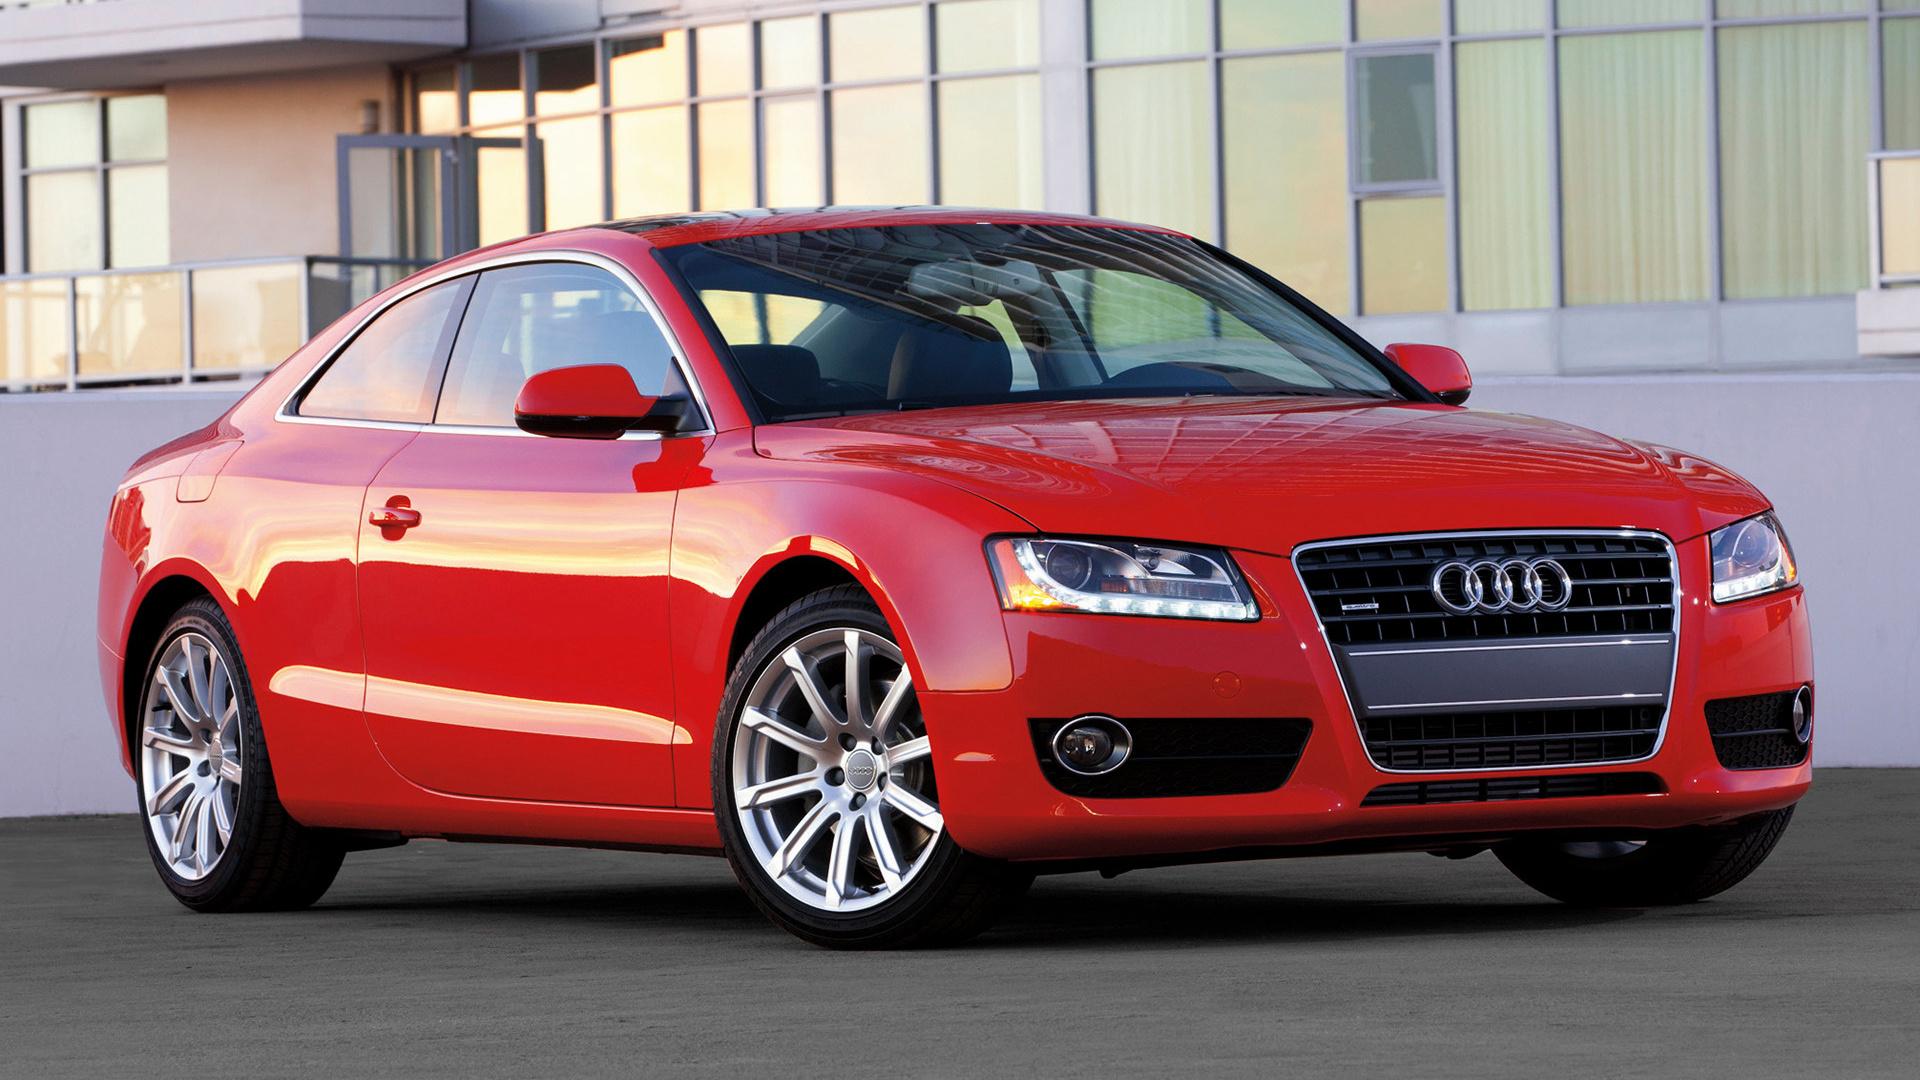 Kelebihan Audi A5 2008 Murah Berkualitas